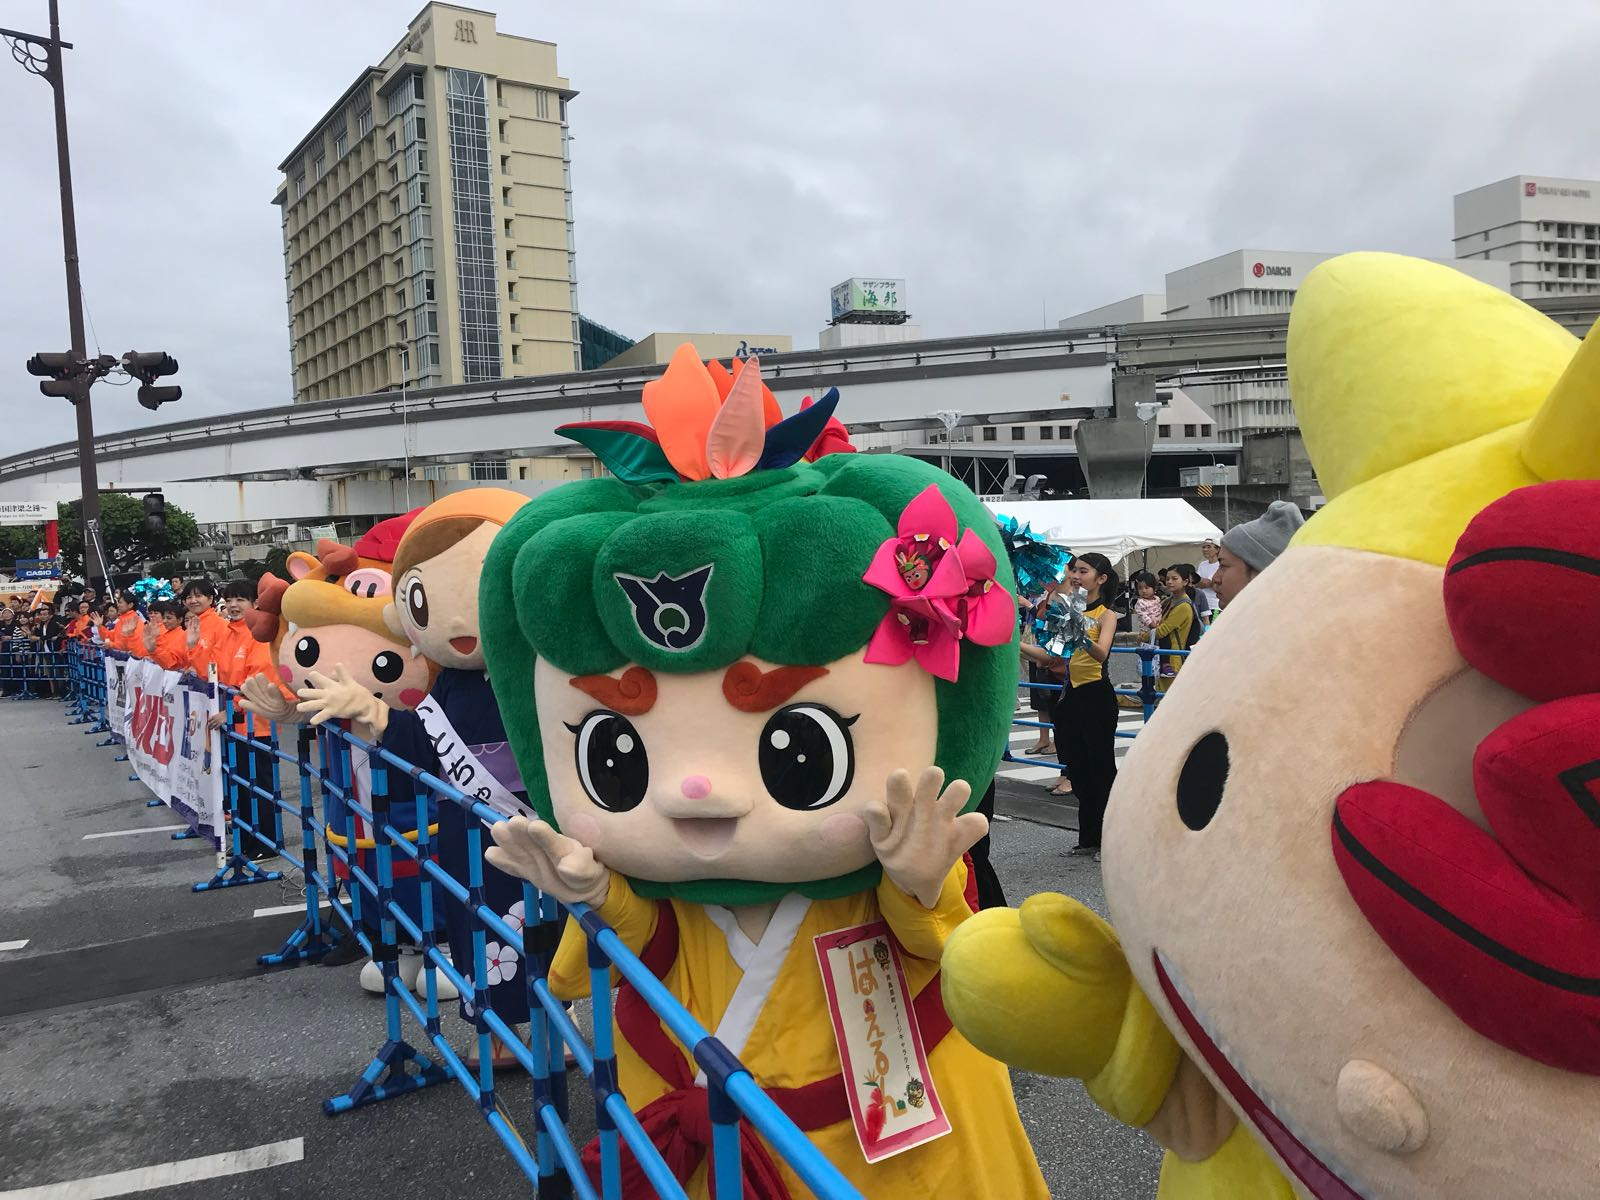 2017-12-27-PHOTO-00000804.jpg